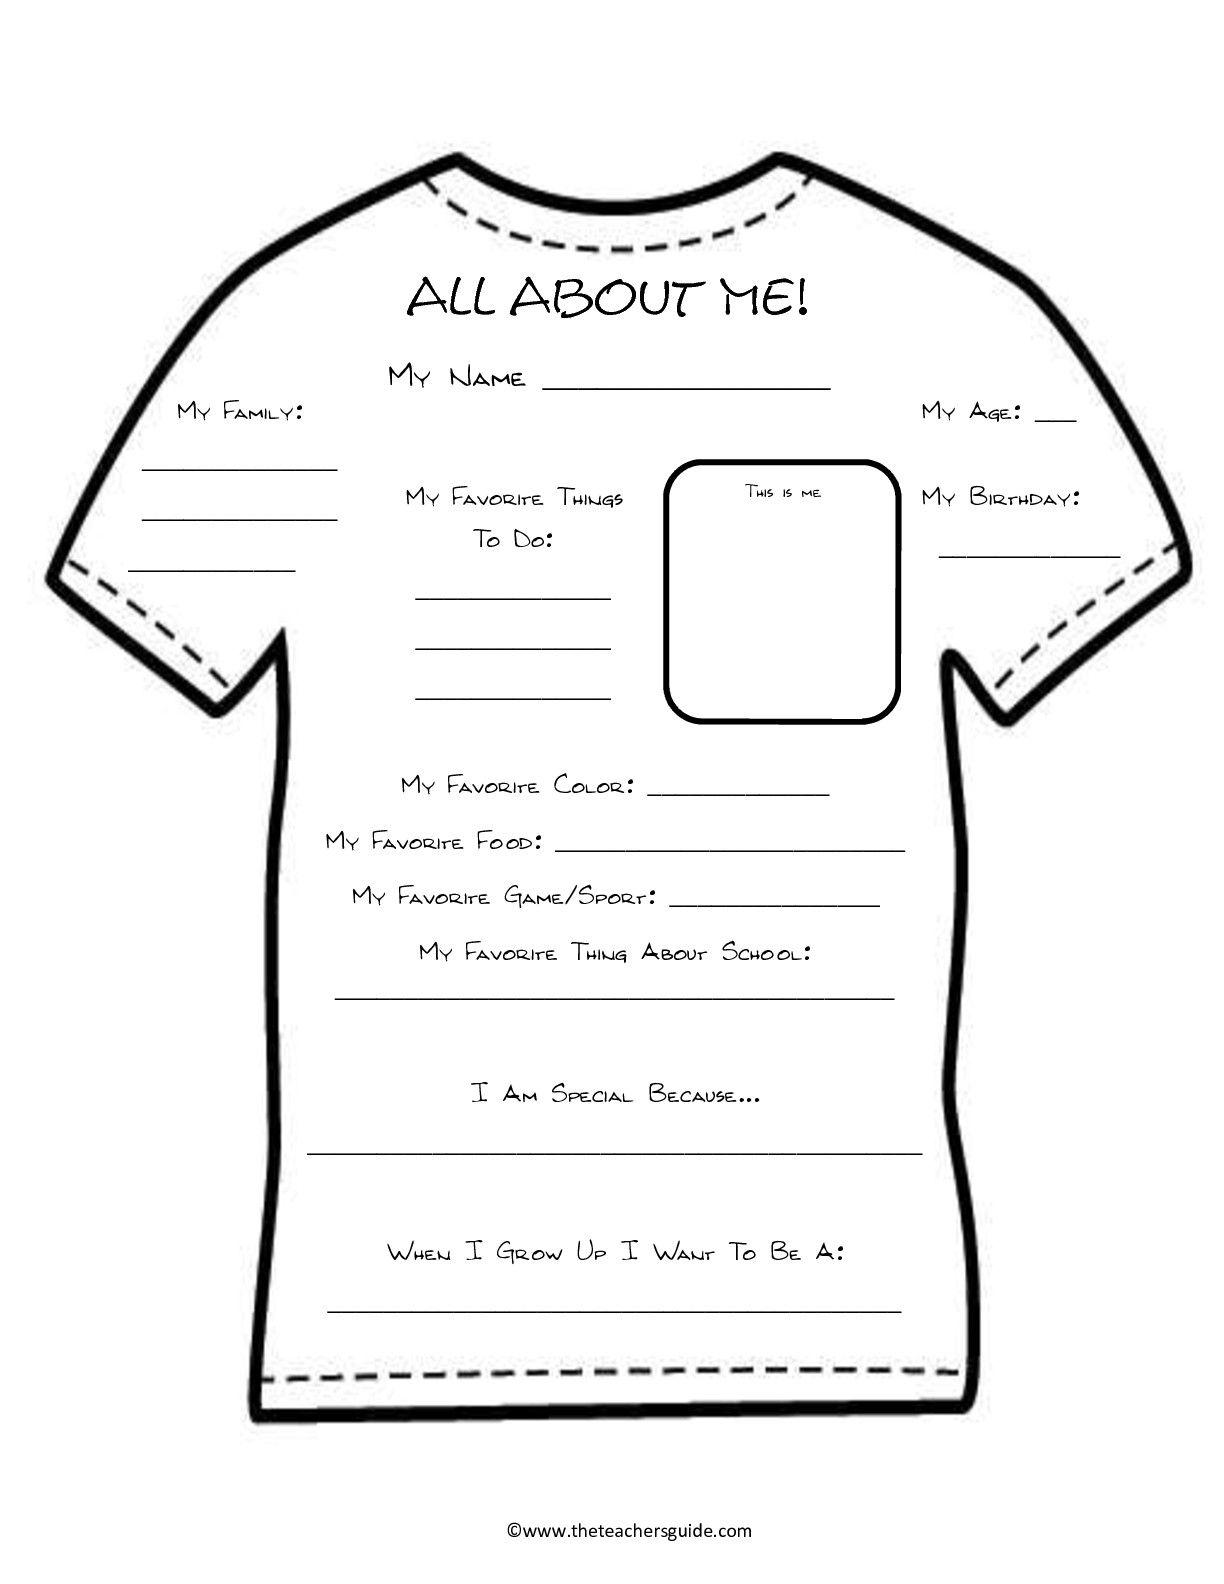 worksheet About Me Worksheet about me worksheet school pinterest all worksheet